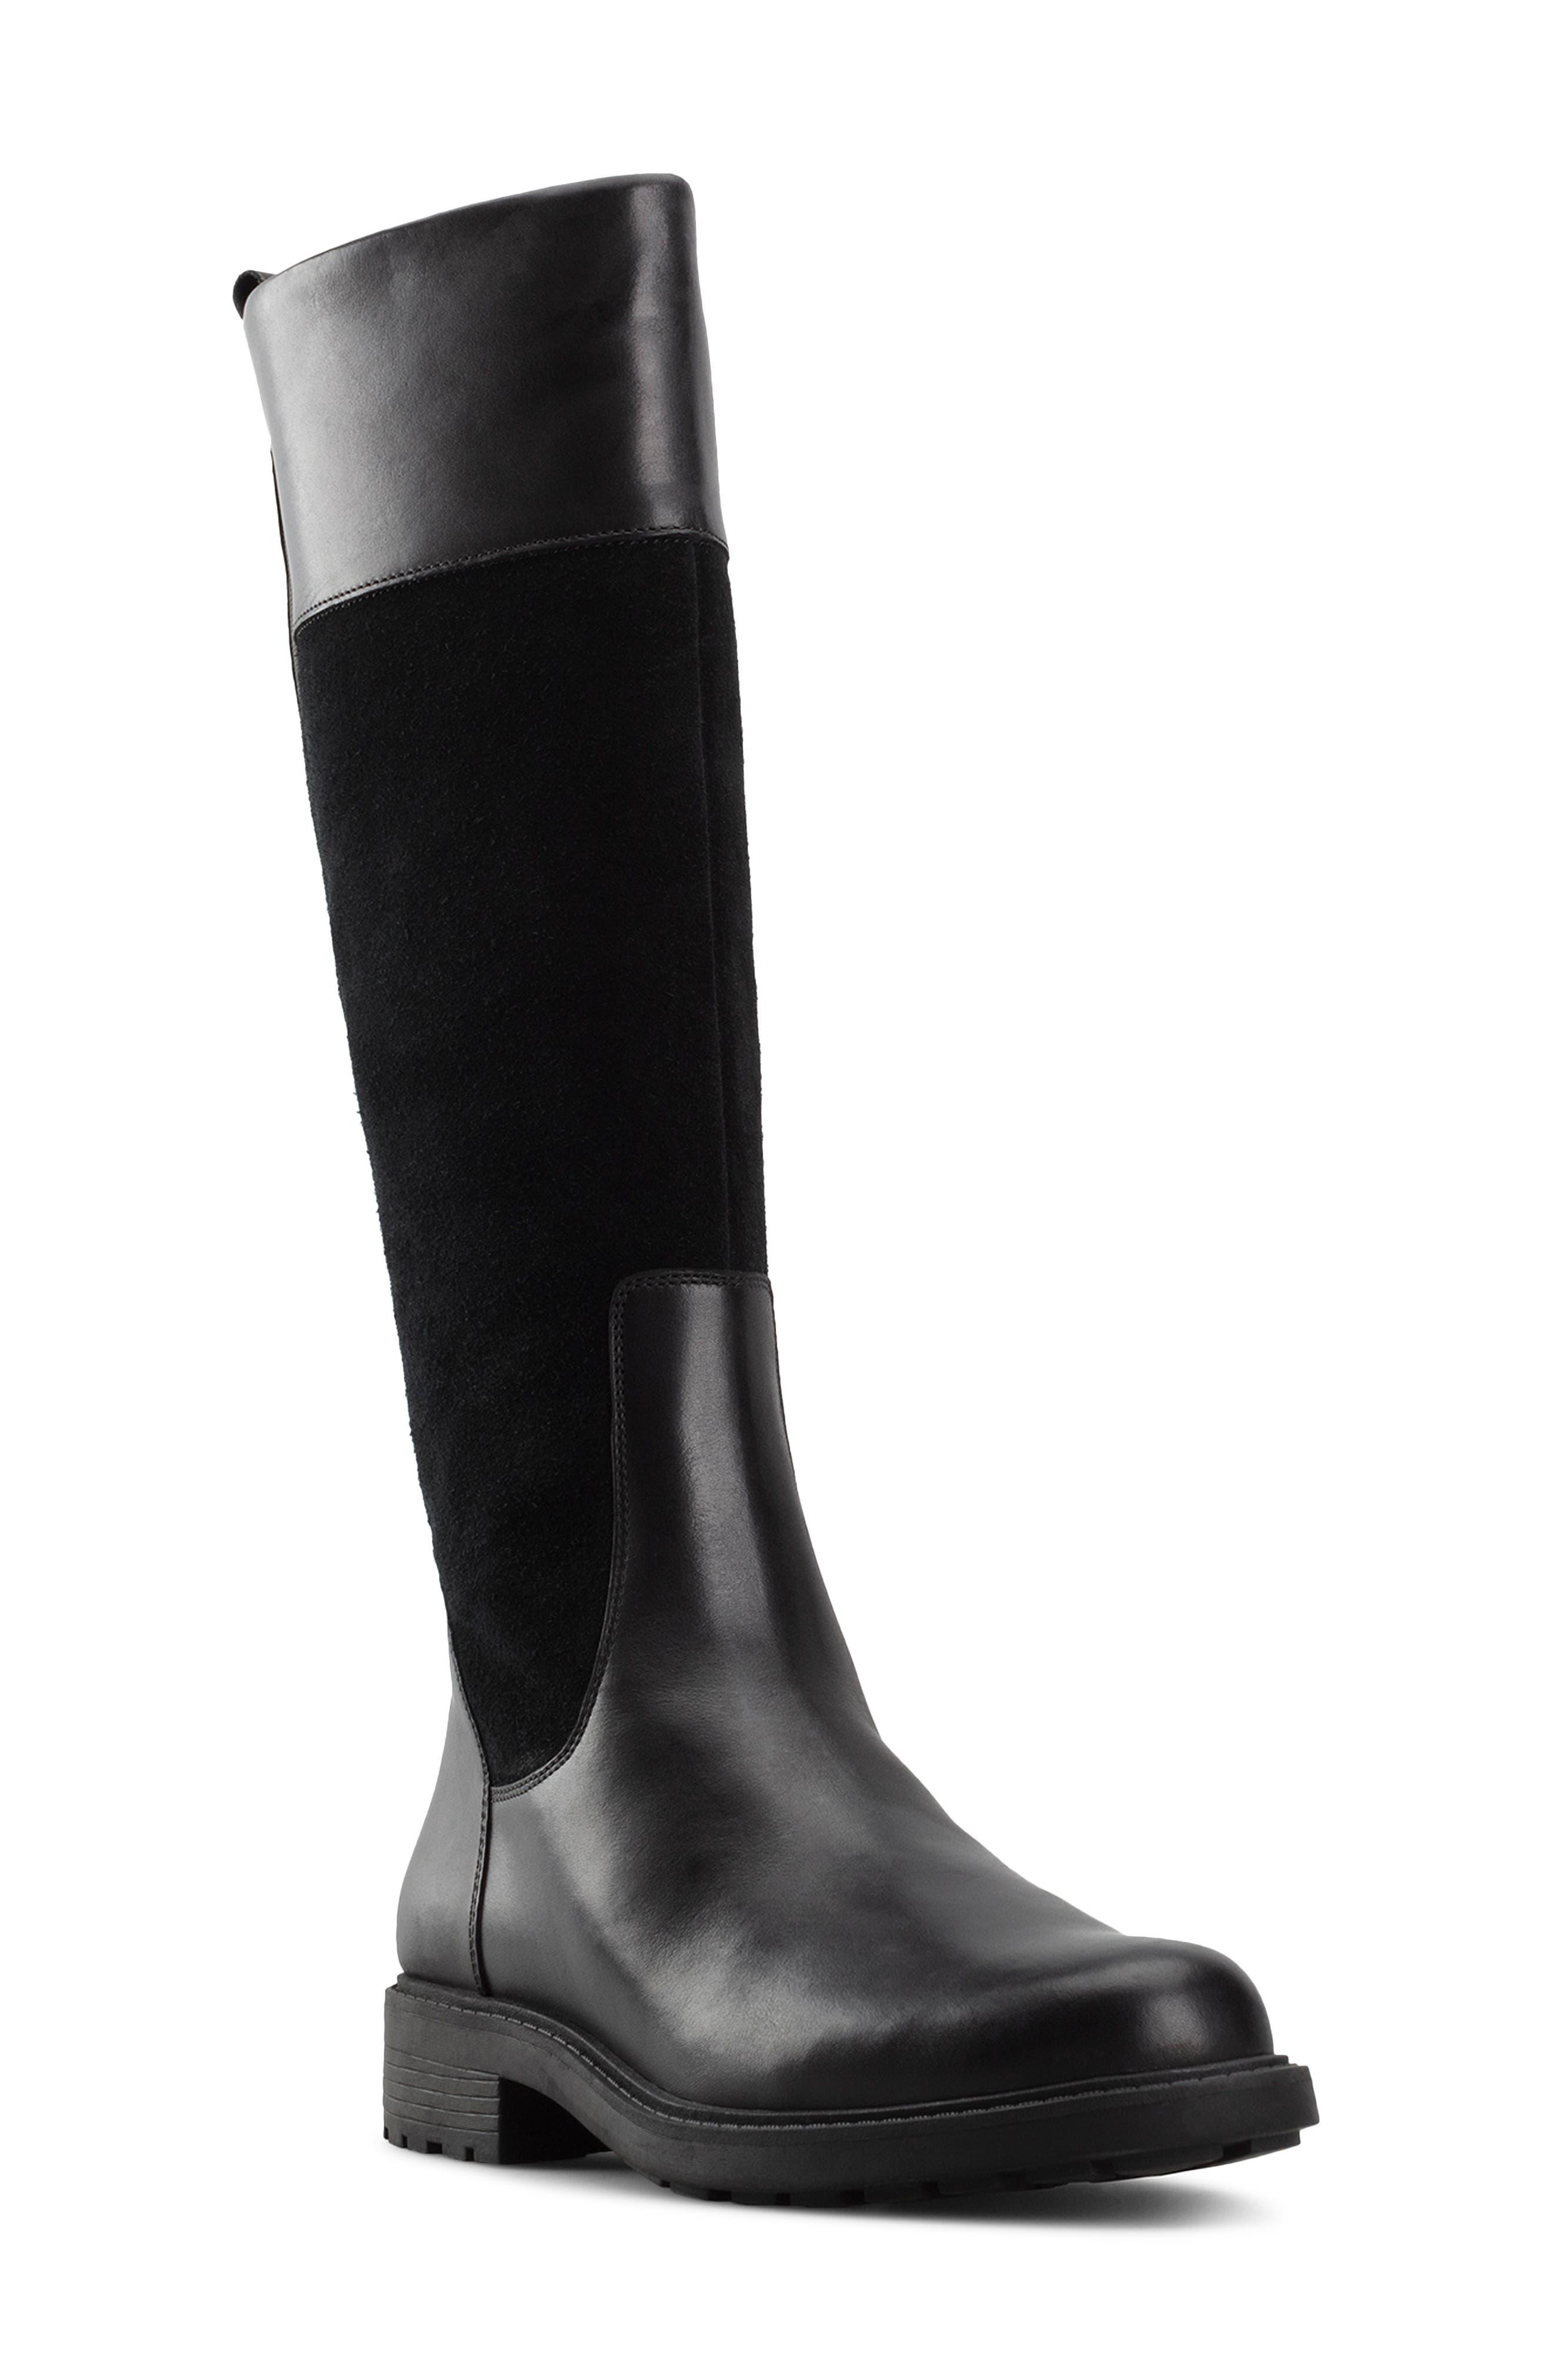 Women's Clarks Orinoco 2 Waterproof Riding Boot